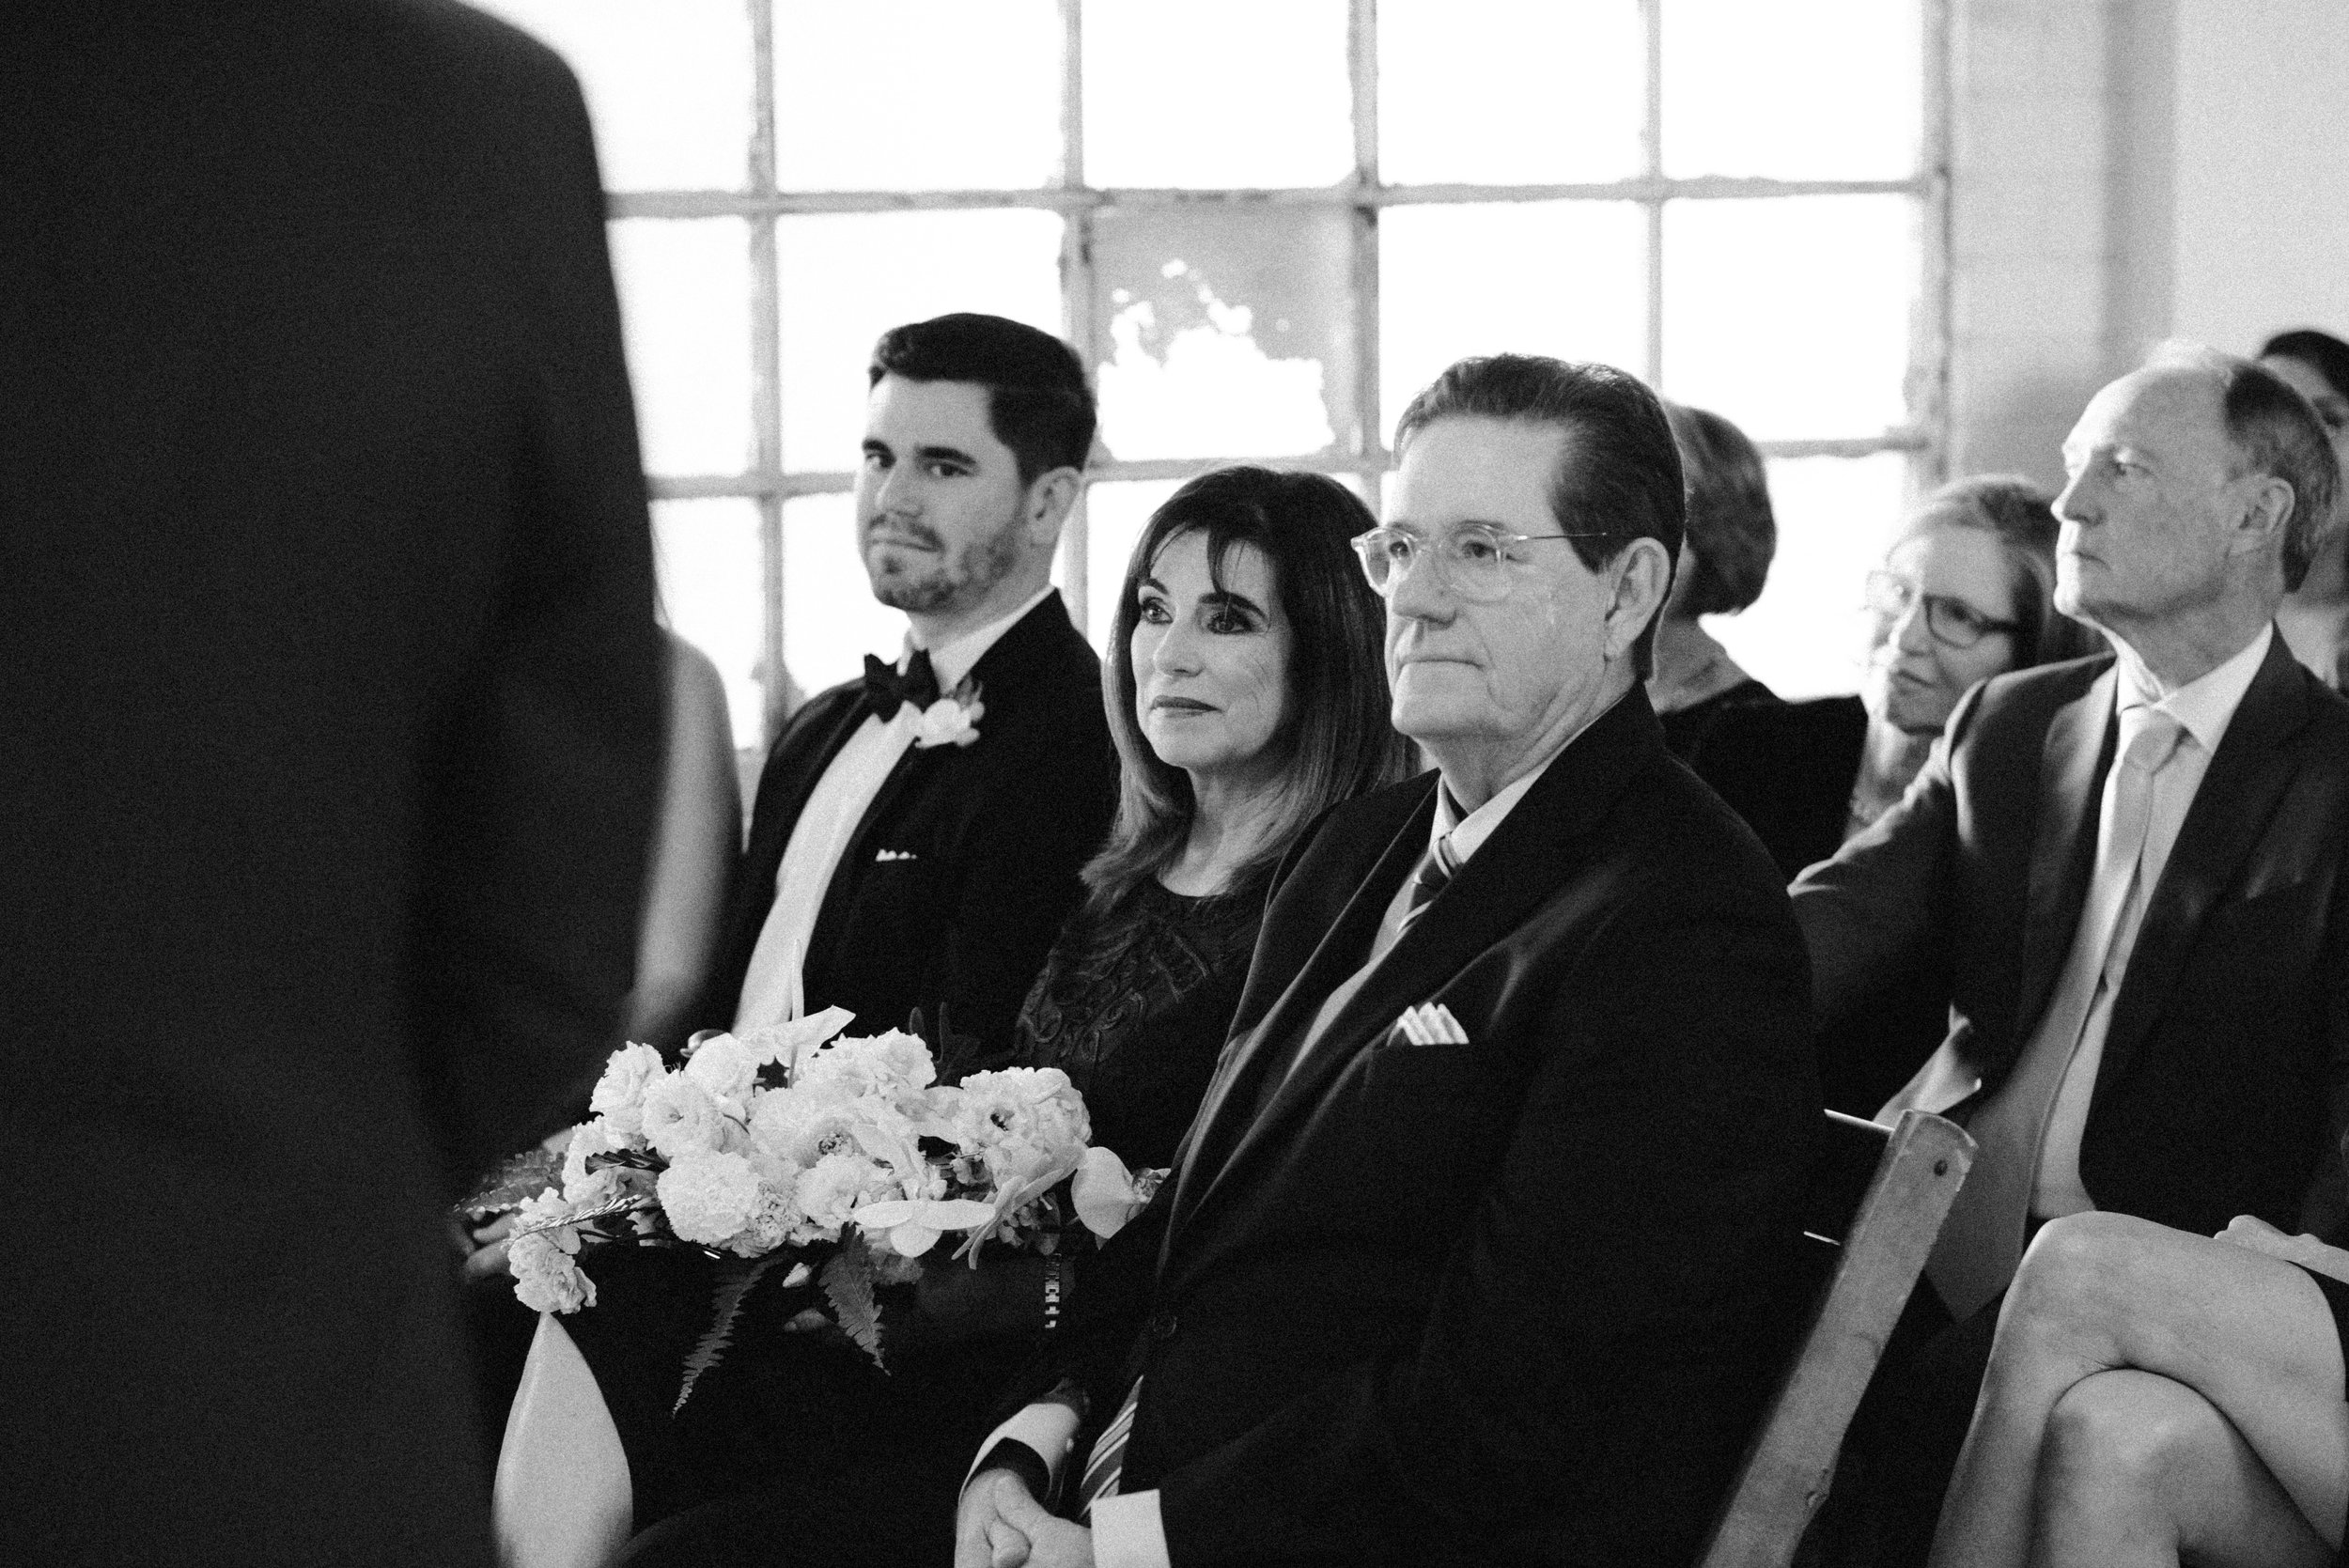 stephanie-bobby-ace-prop-house-miami-florida-wedding-831.jpg